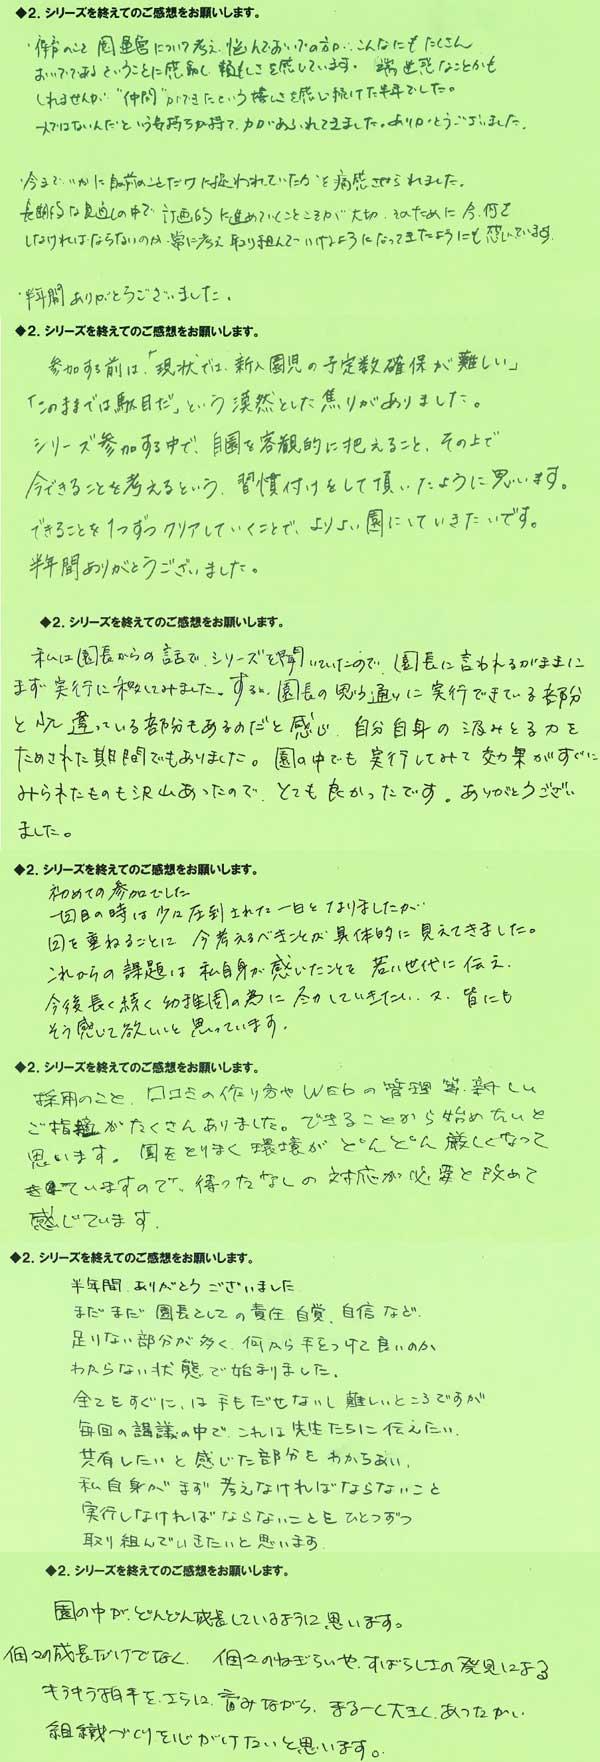 幼稚園元気塾第6回ご感想